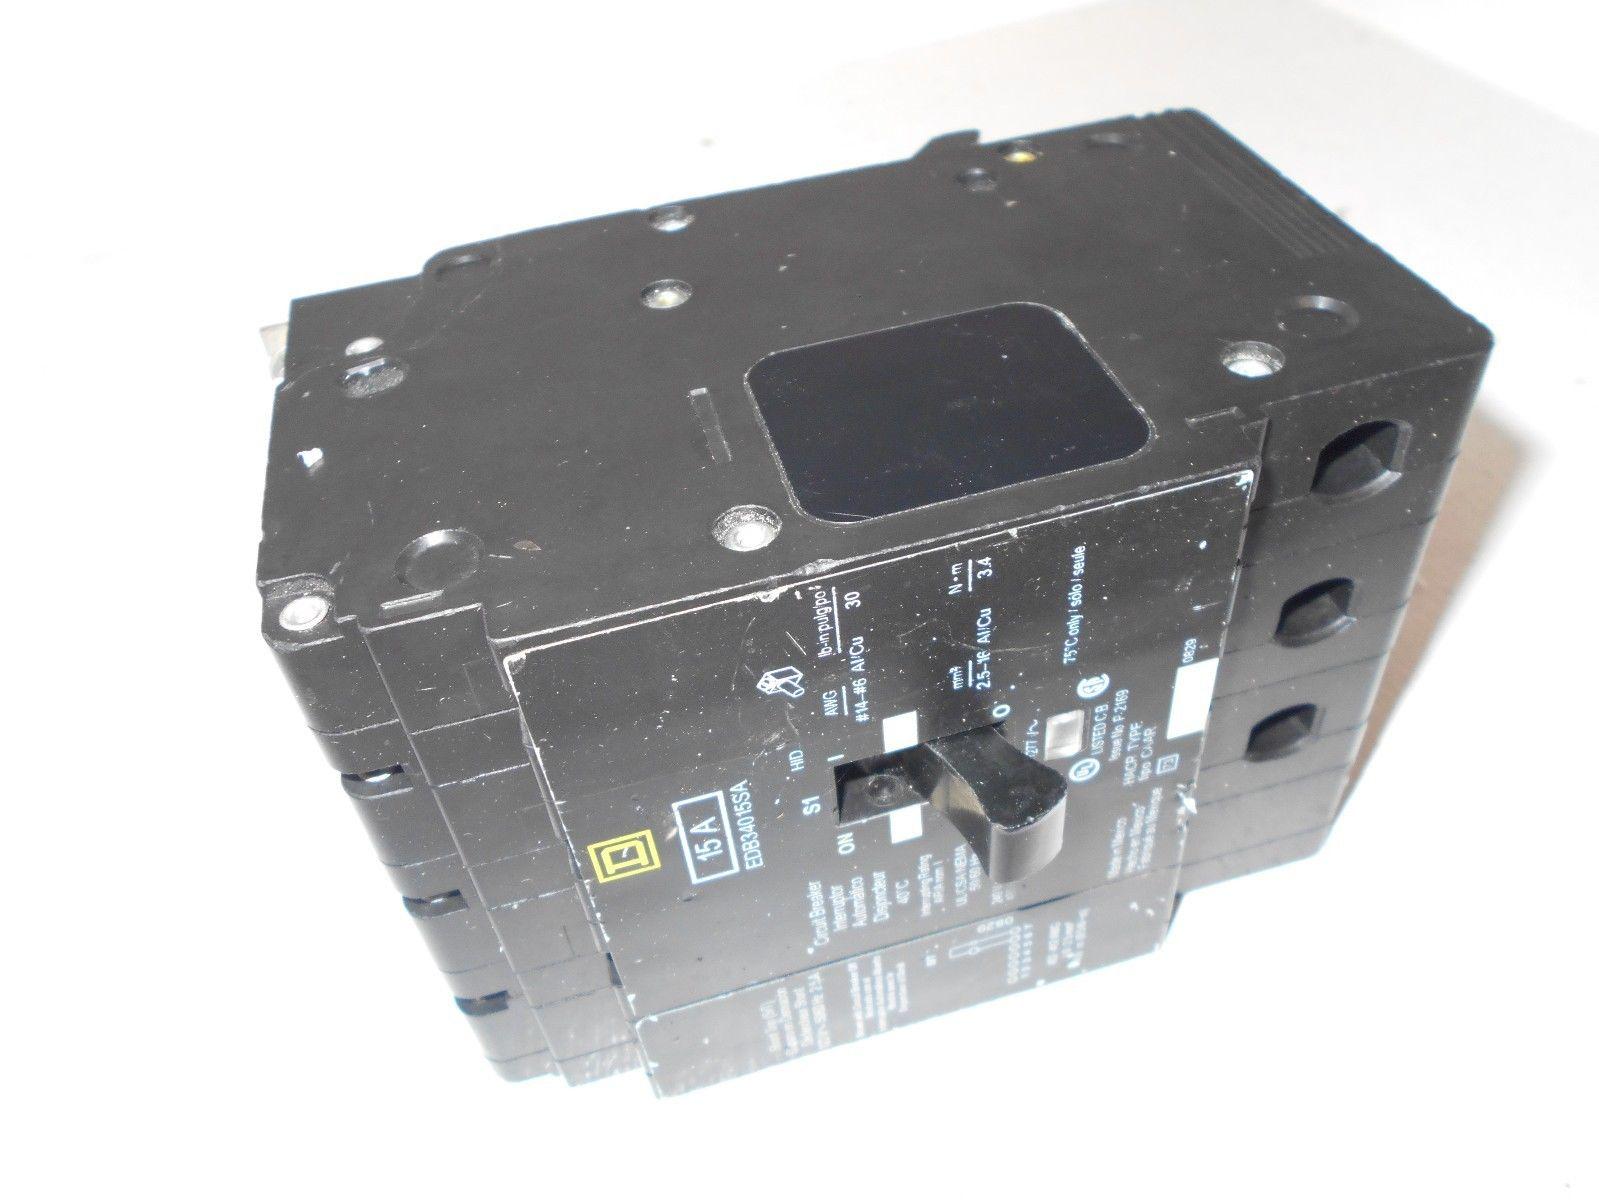 New Square D Edb34015sa 3 Pole 15 Amp 480v Circuit Breaker W 120v Image